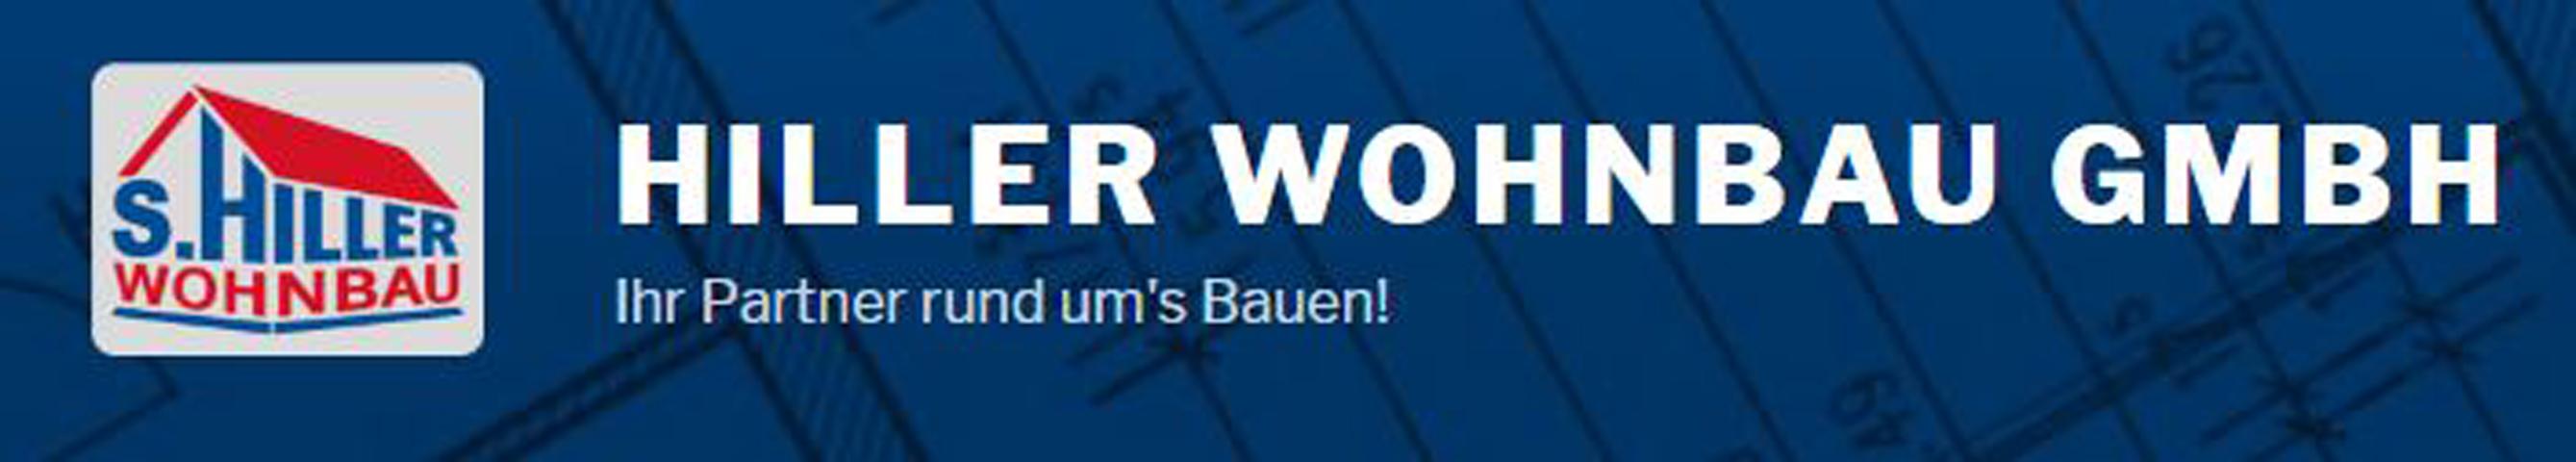 Hiller Wohnbau GmbH